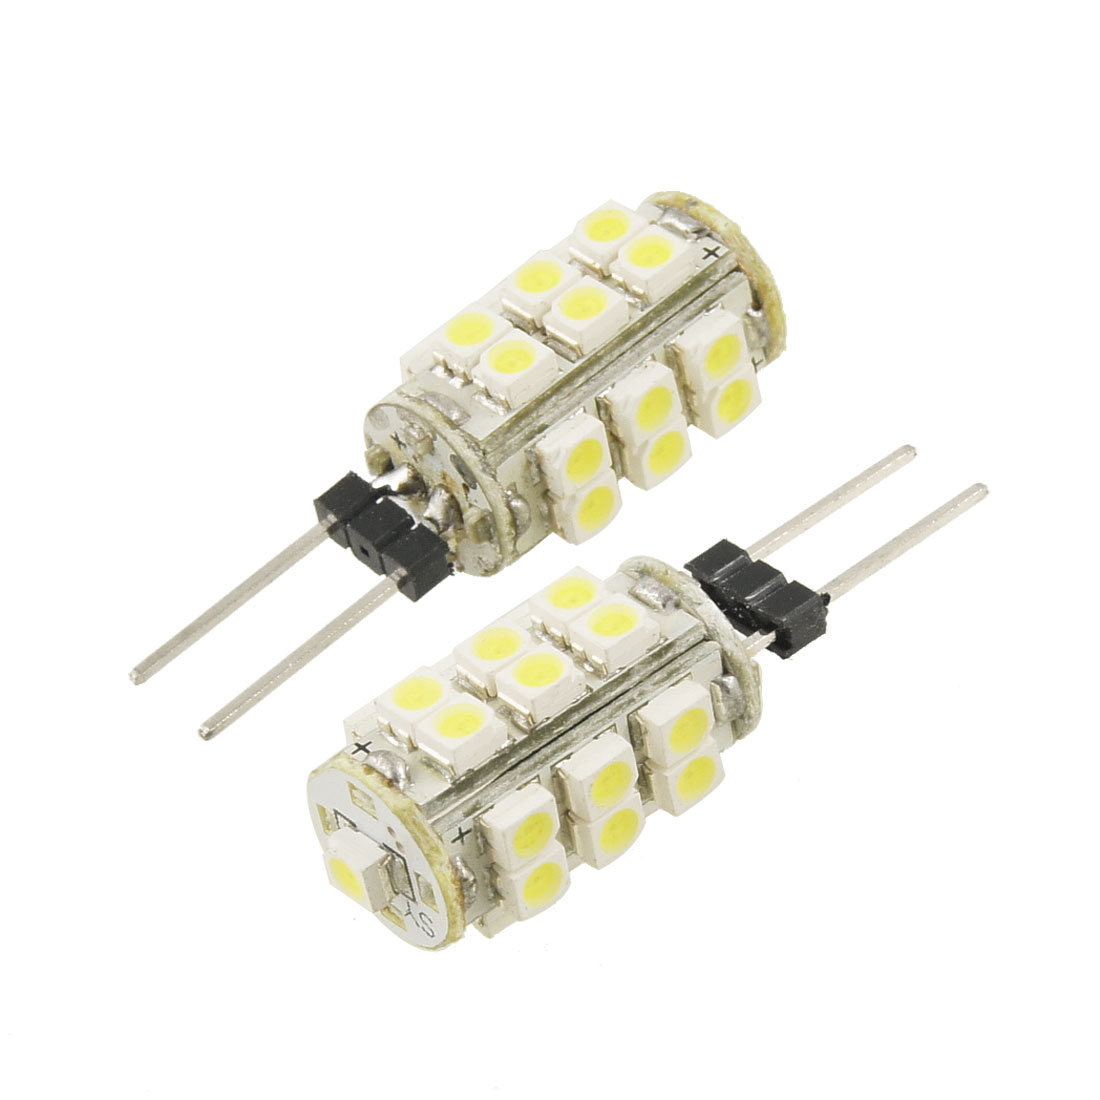 Unique Bargains Unique Bargains 2 x White 1210 SMD 25 LED Lamp G4 Back Pin Lights Bulbs for Car new